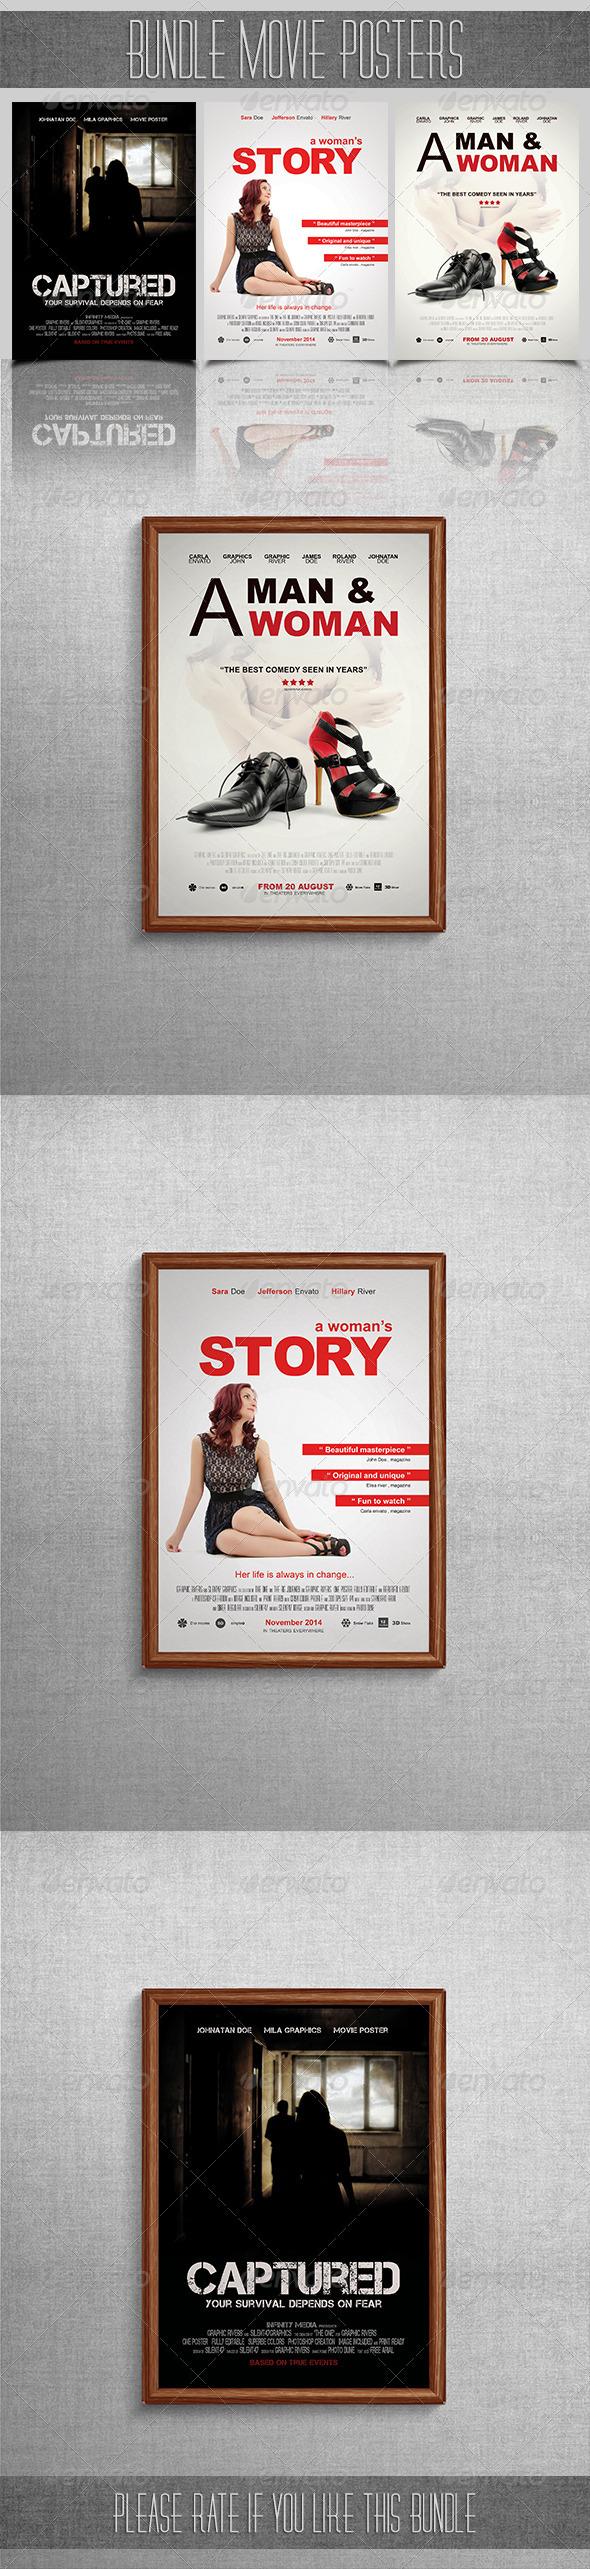 GraphicRiver Bundle Movie Posters 7370958